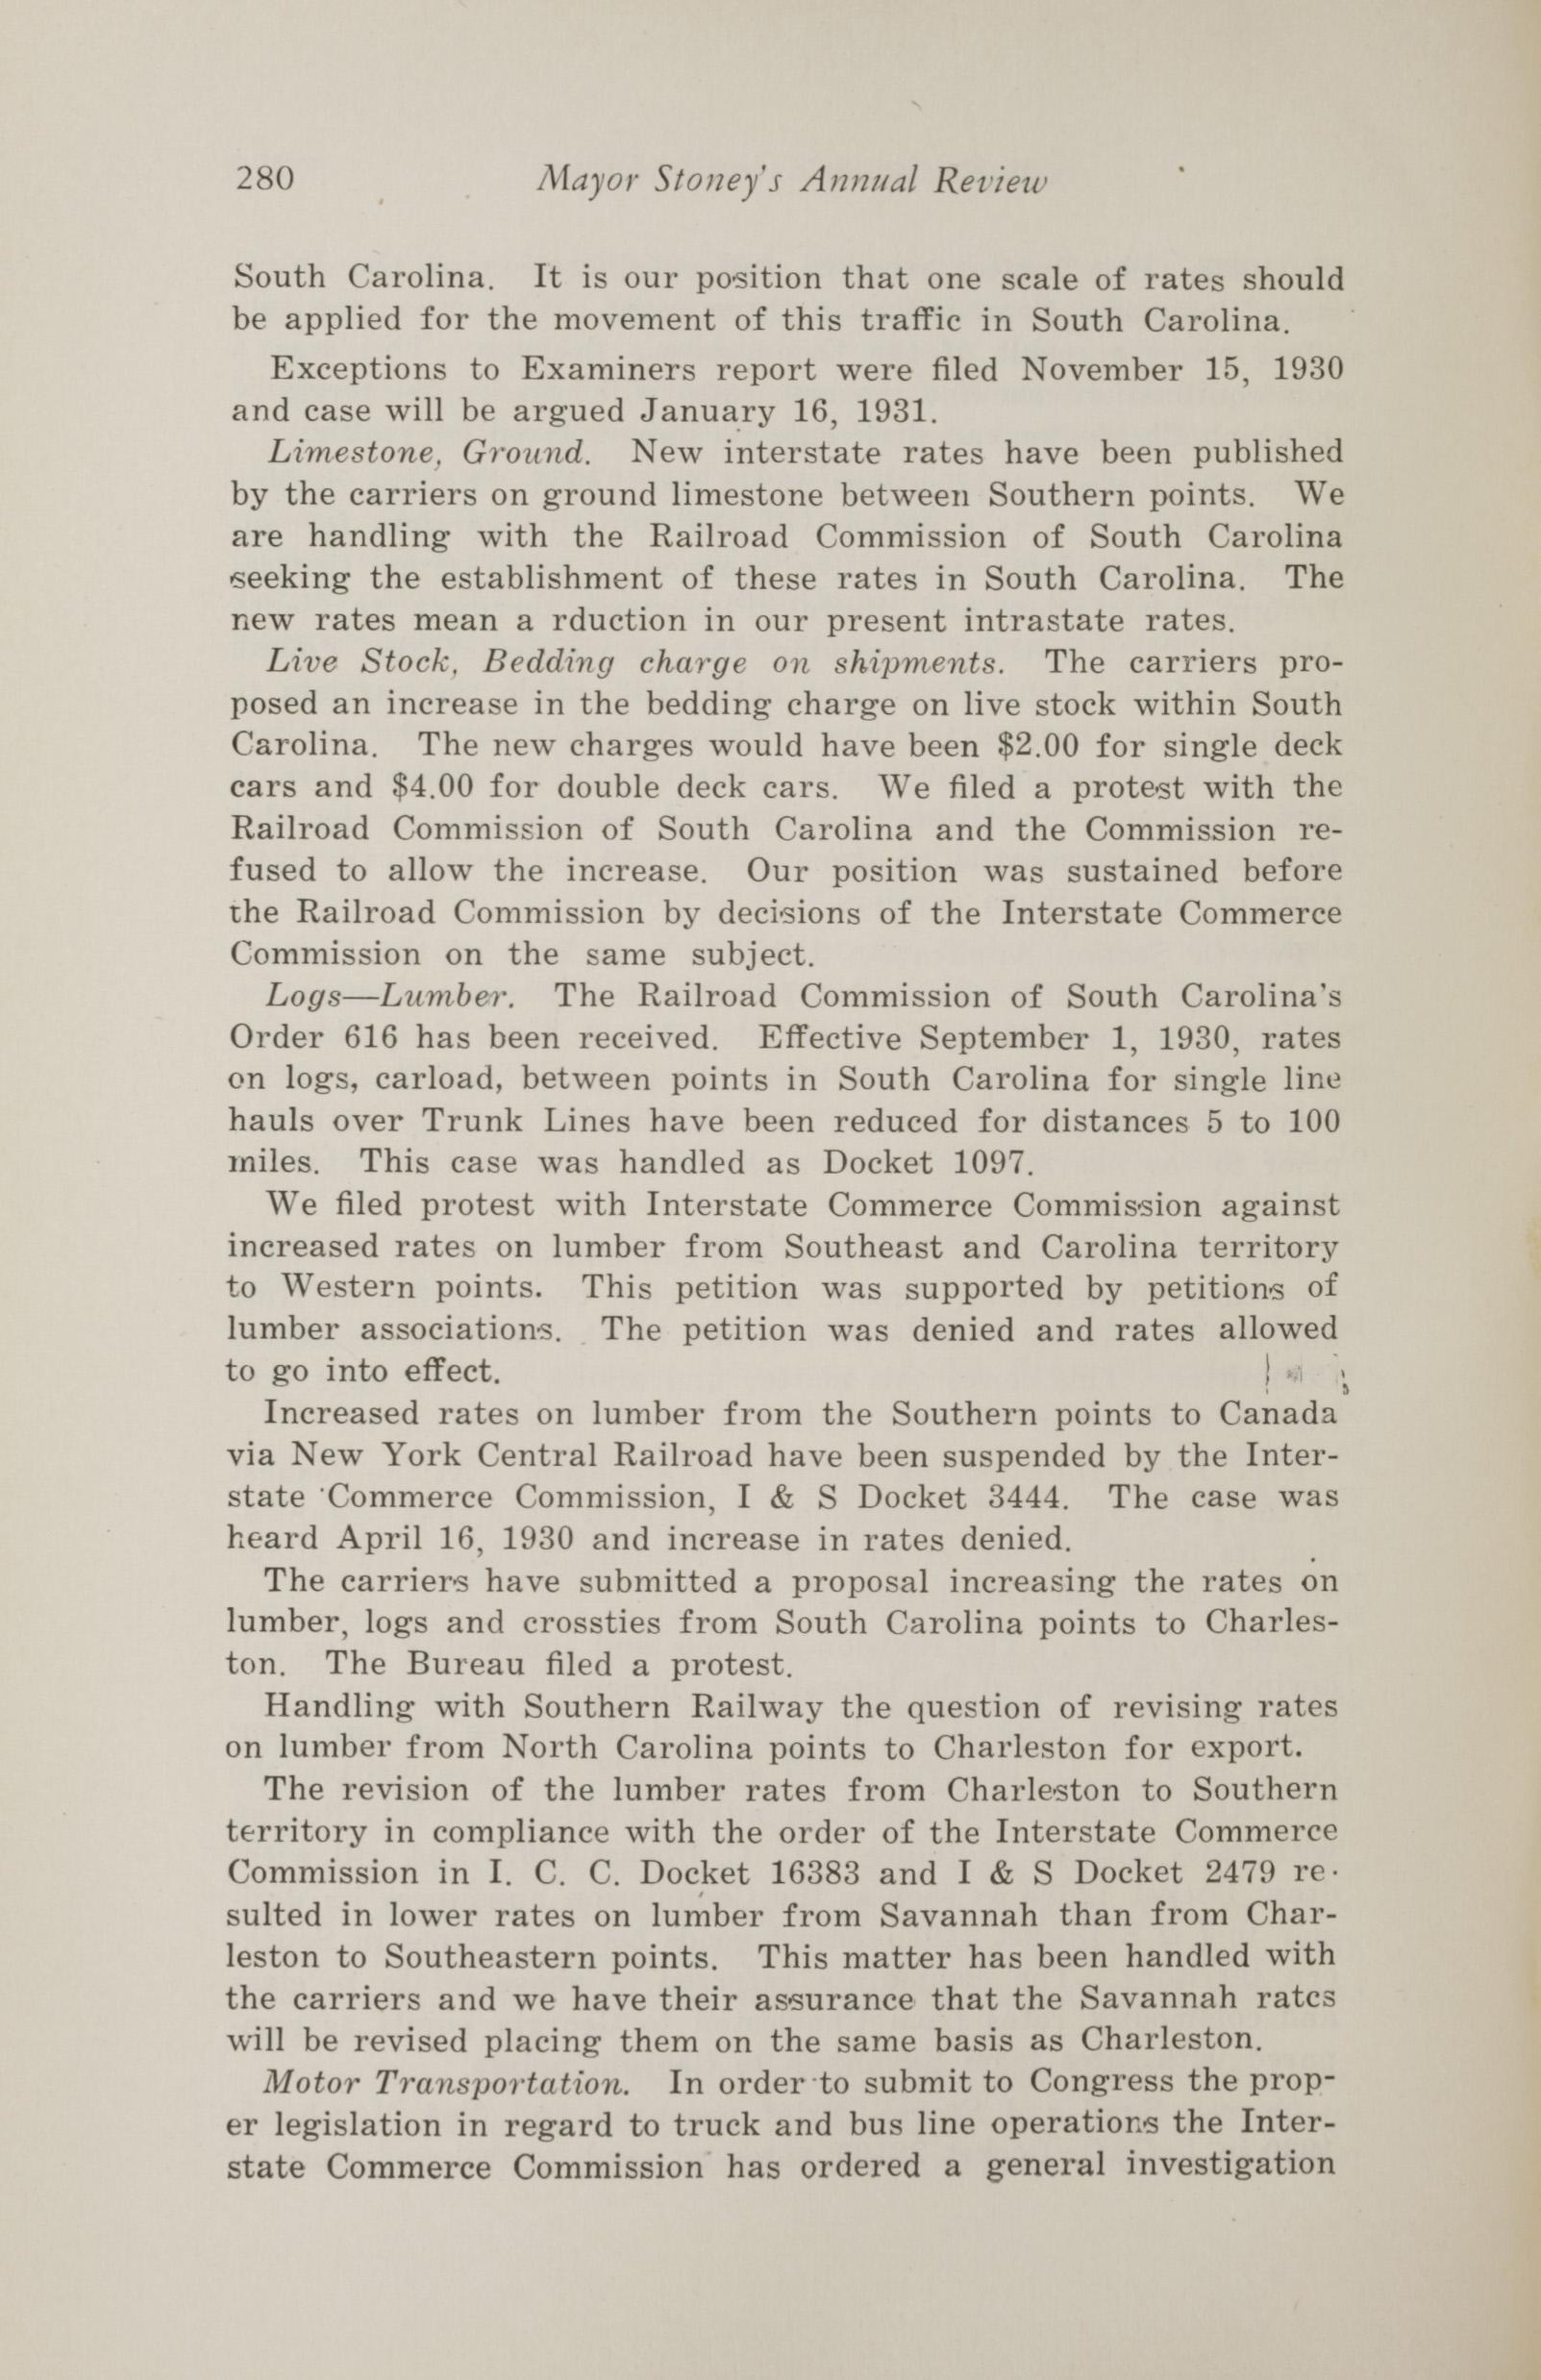 Charleston Yearbook, 1930, page 280